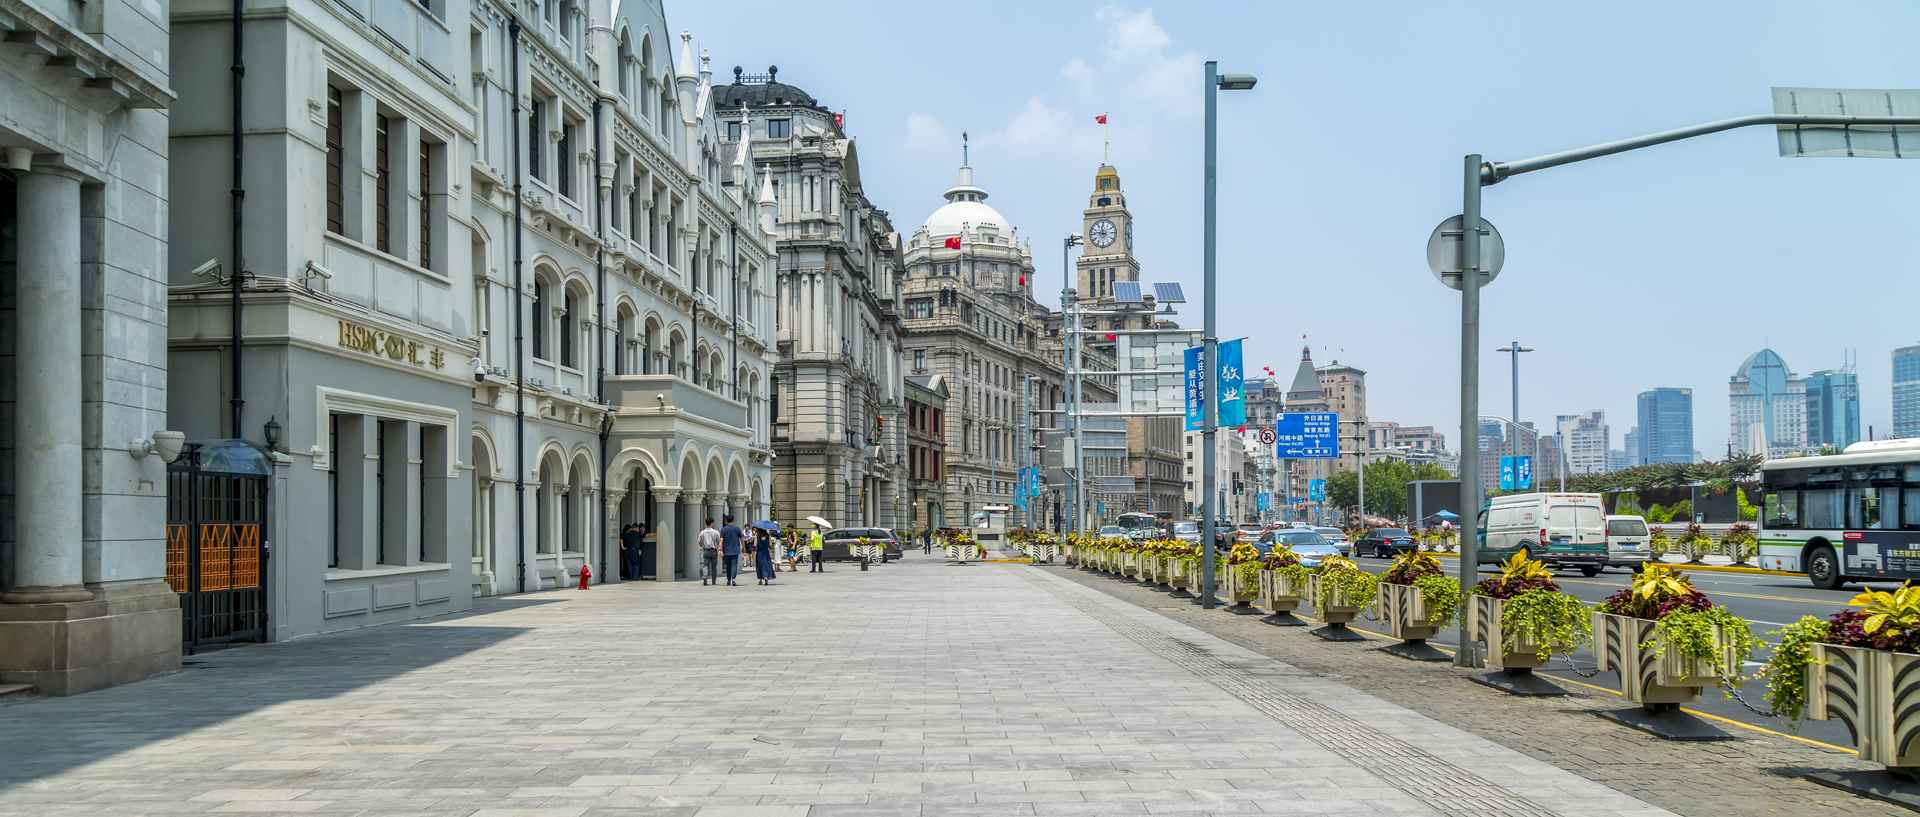 Smart tech providing safer streets in Shanghai